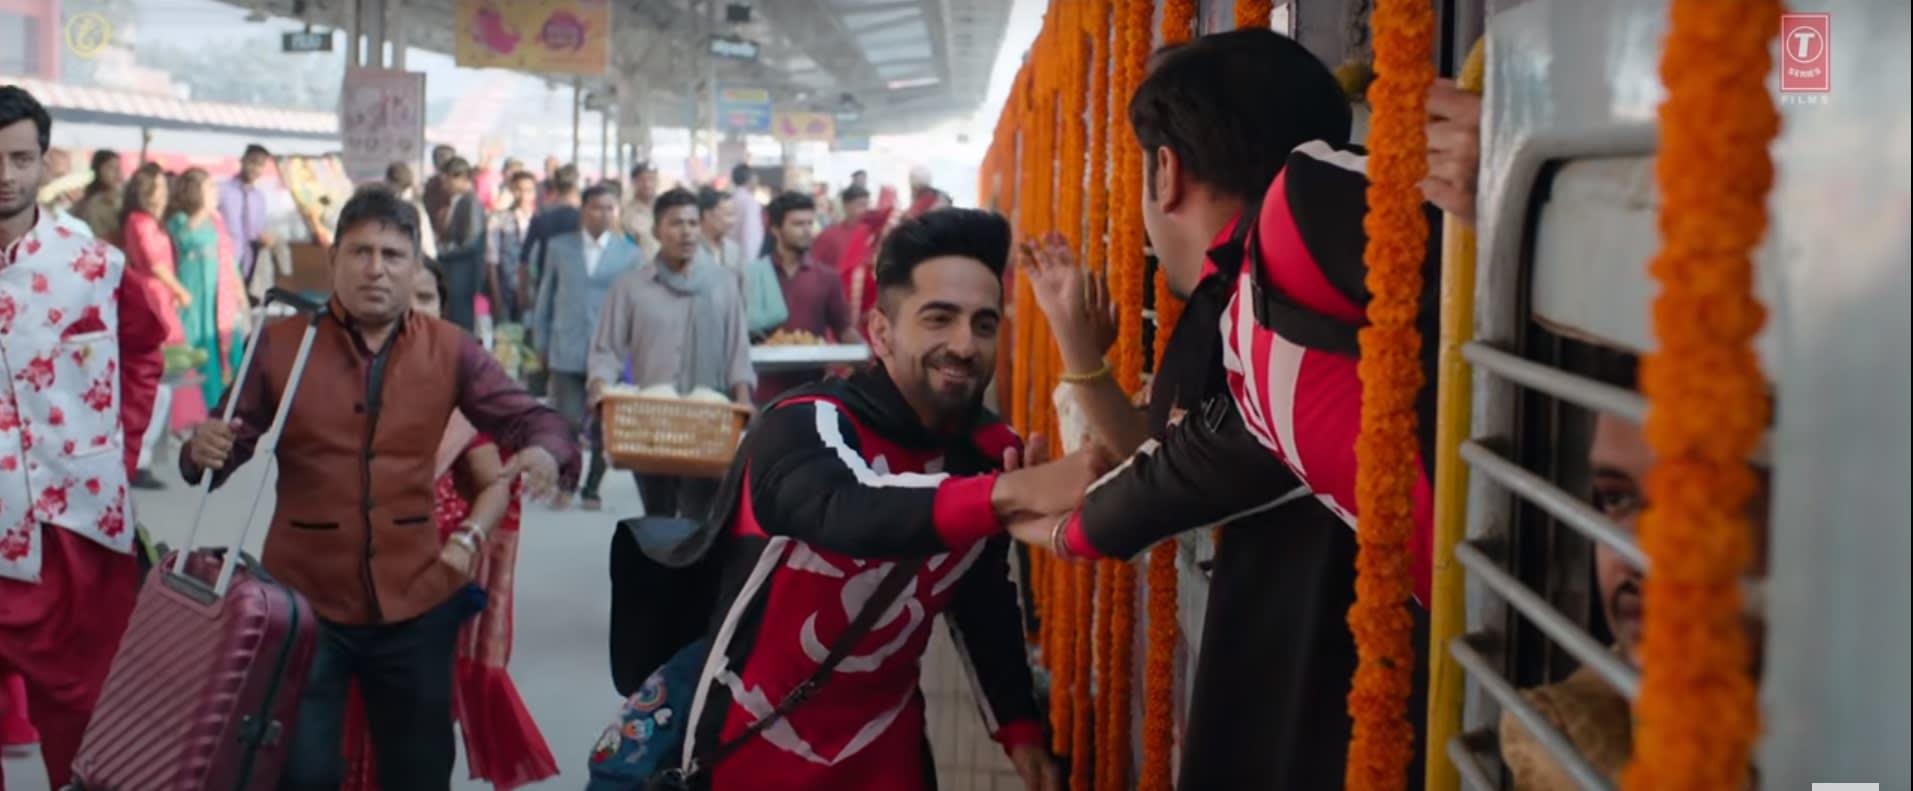 shubh mangal zyada savdhan full movie download filmyzilla